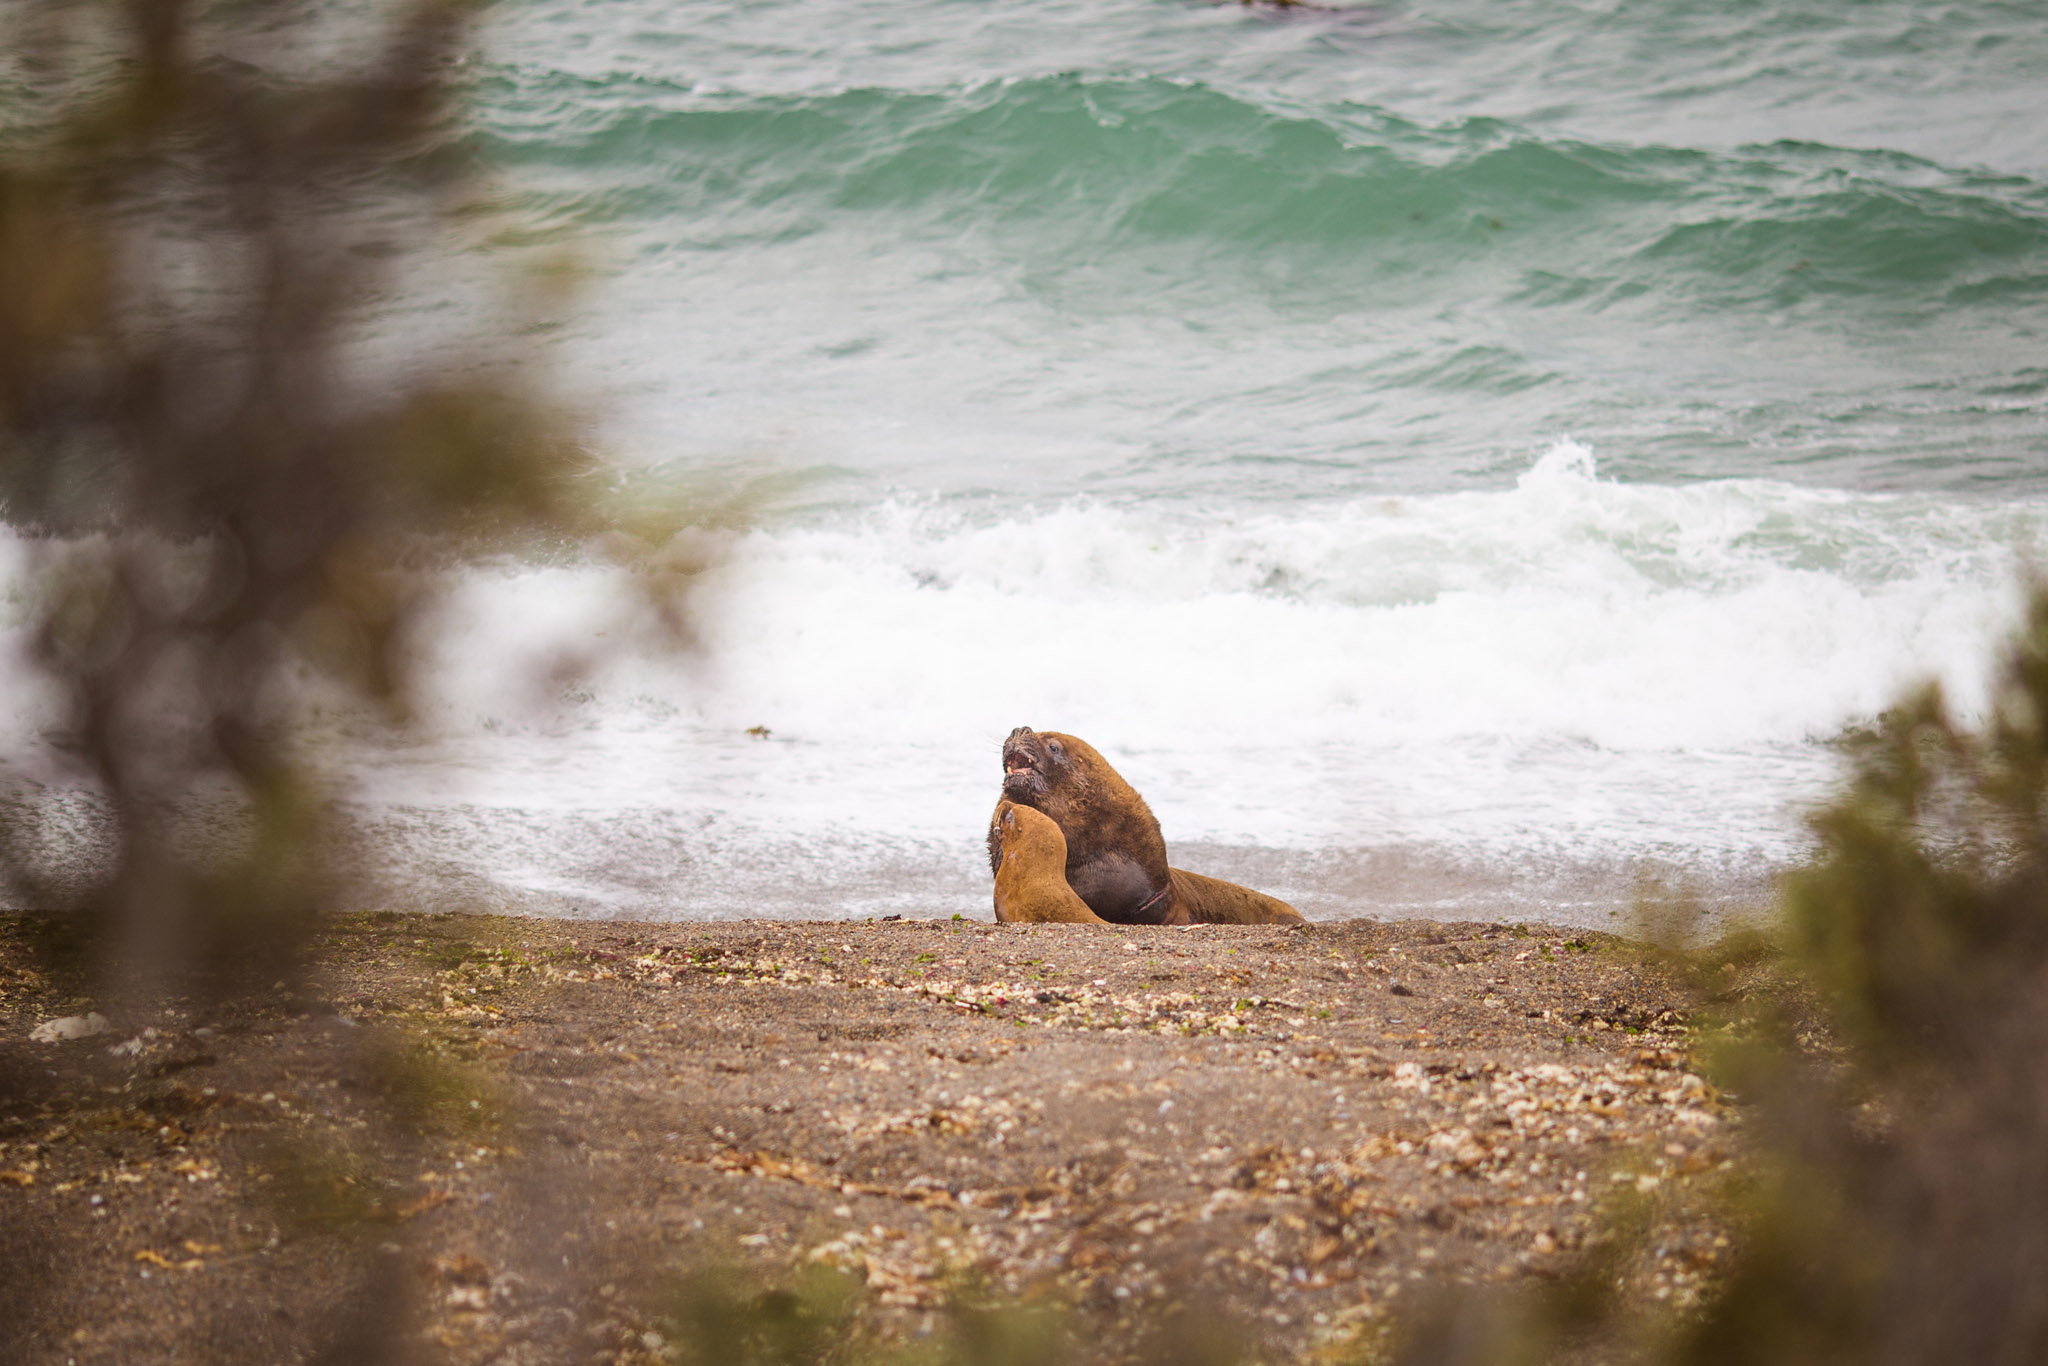 wedding-travellers-argentina-peninsula-valdes-sea-lion-couple